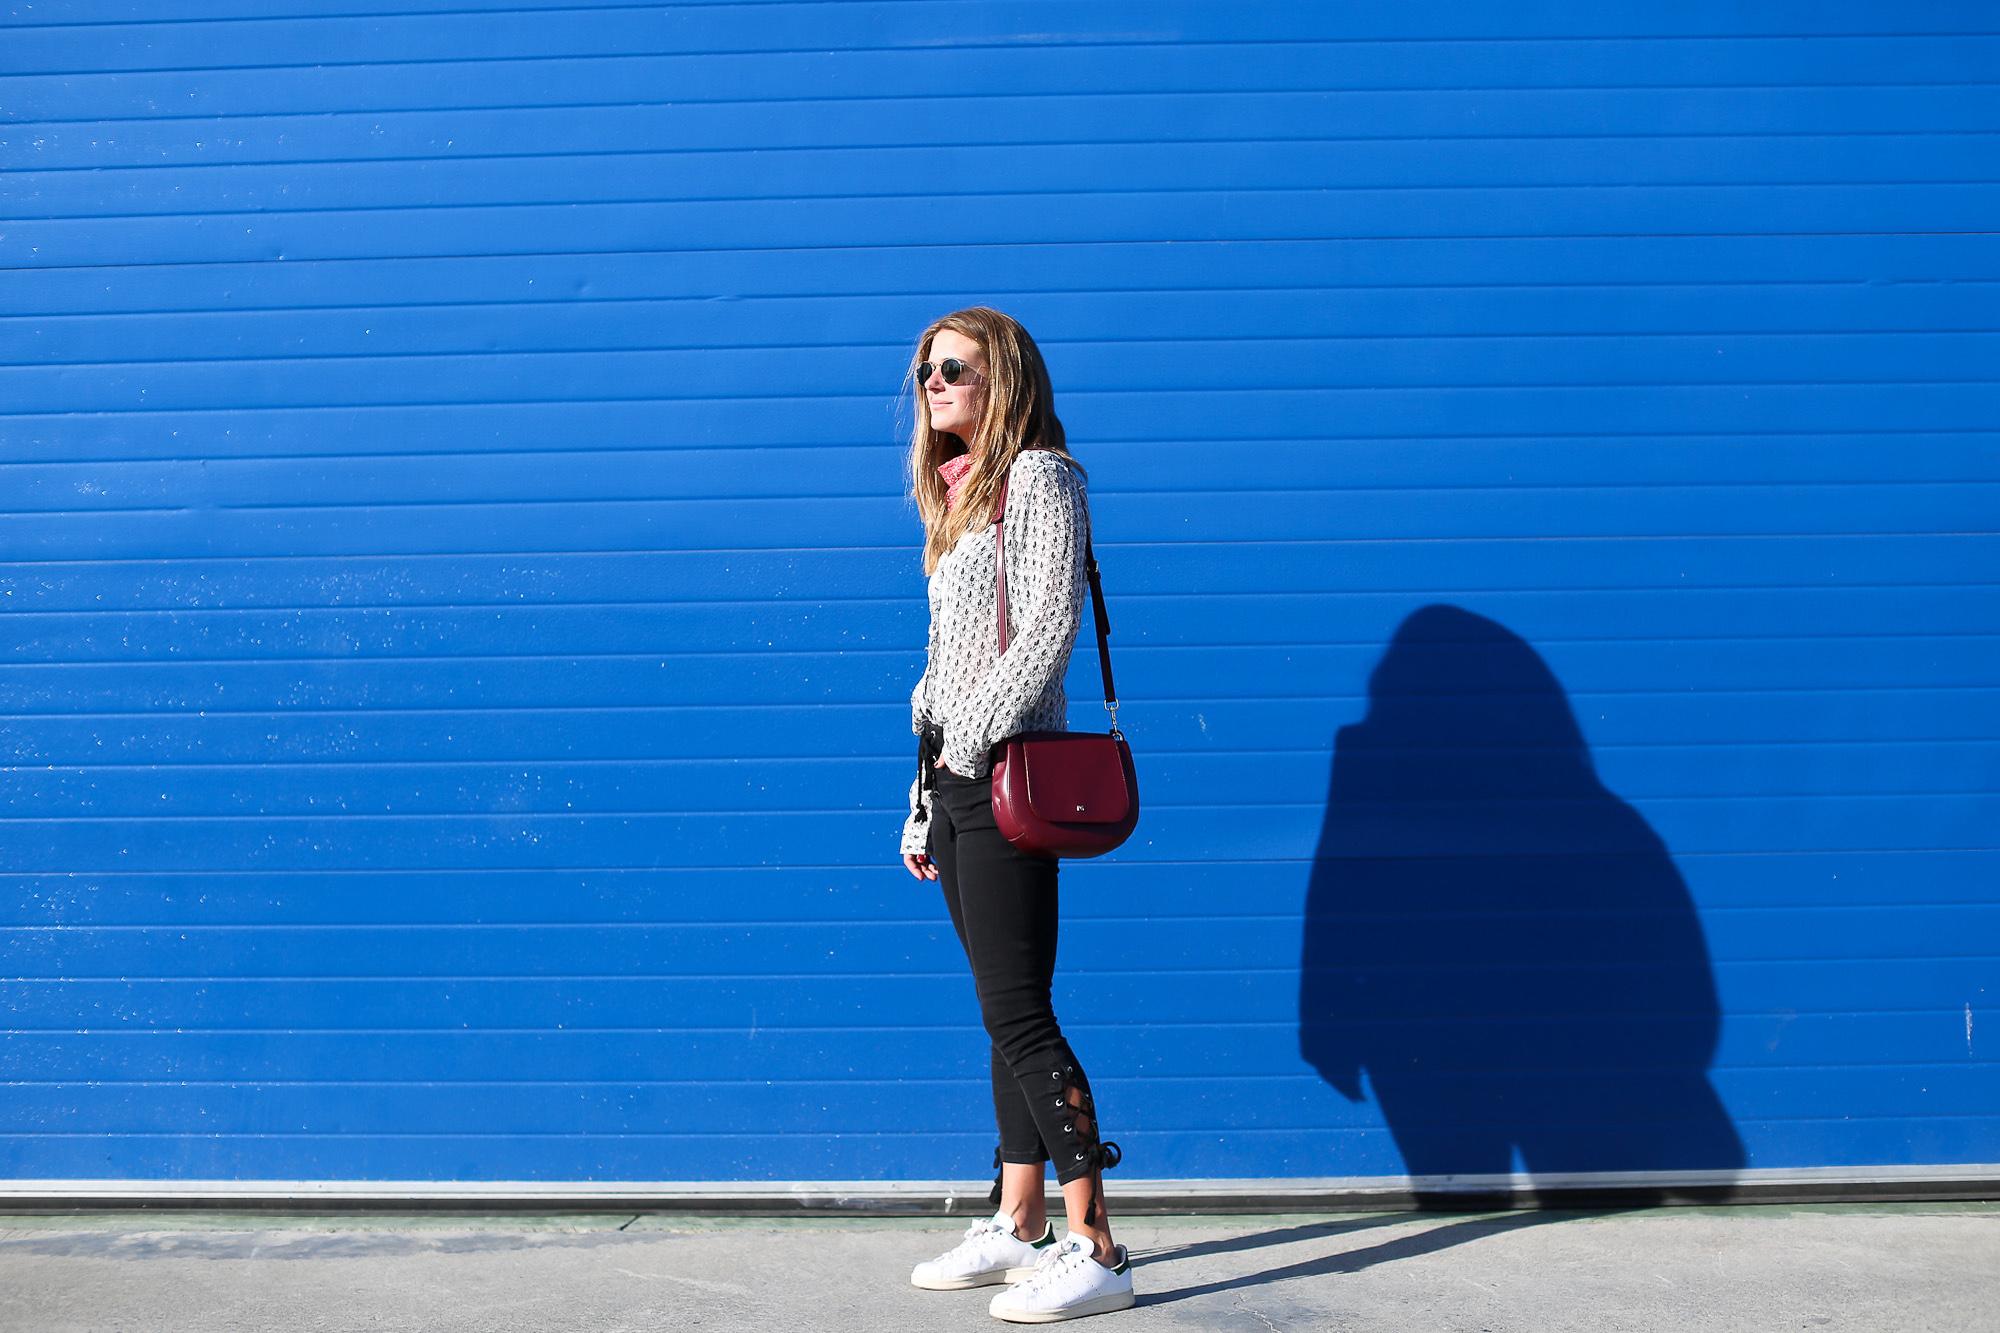 Clochet_streetstyle_fashionblogger_concordneo_adidasstansmith_mangomarantjeans-4